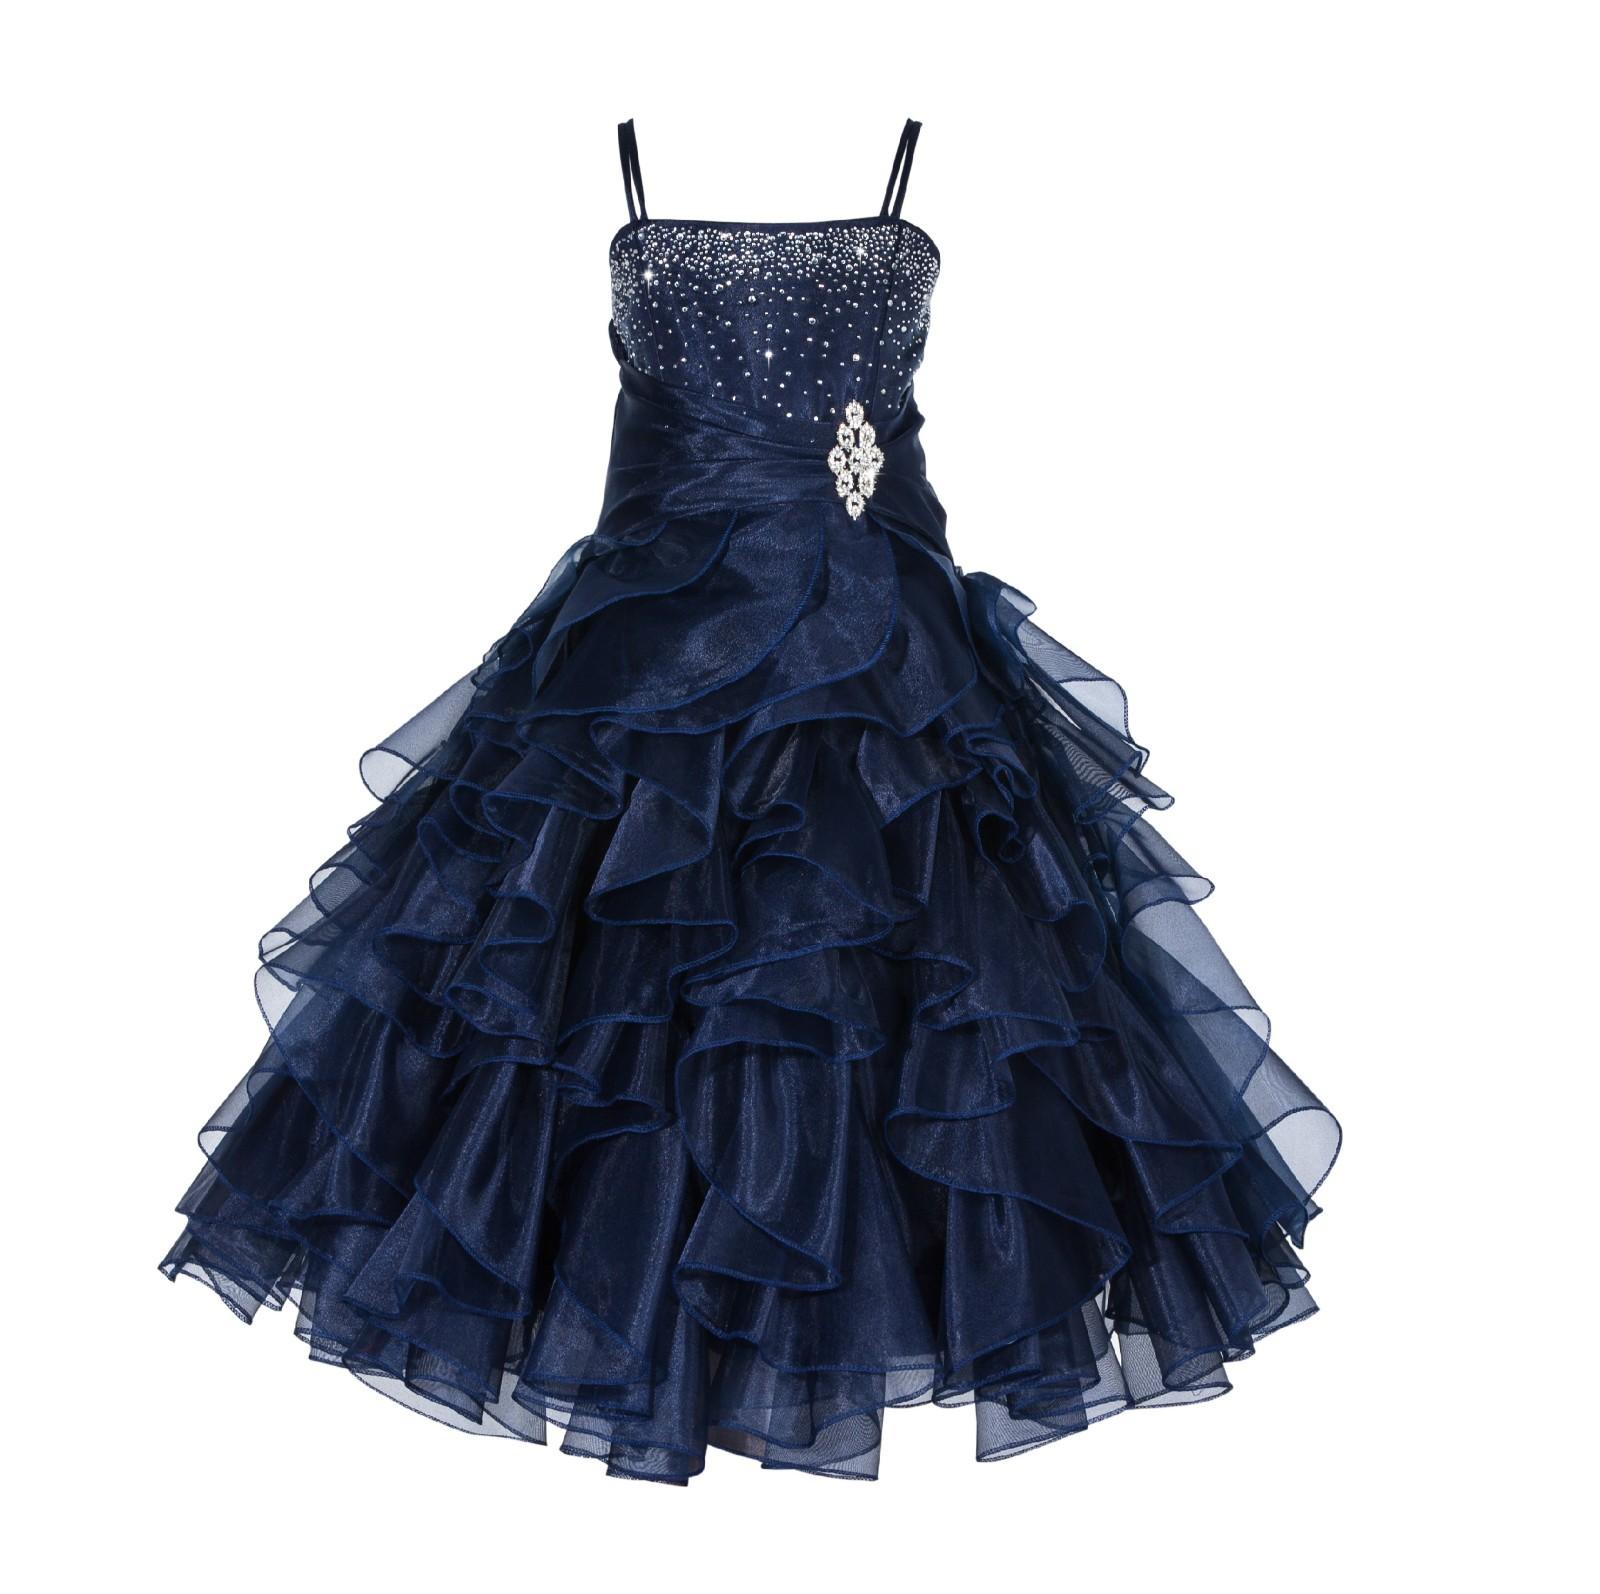 Marine Rhinestone Organza Layers Flower Girl Dress Elegant Stunning 164S